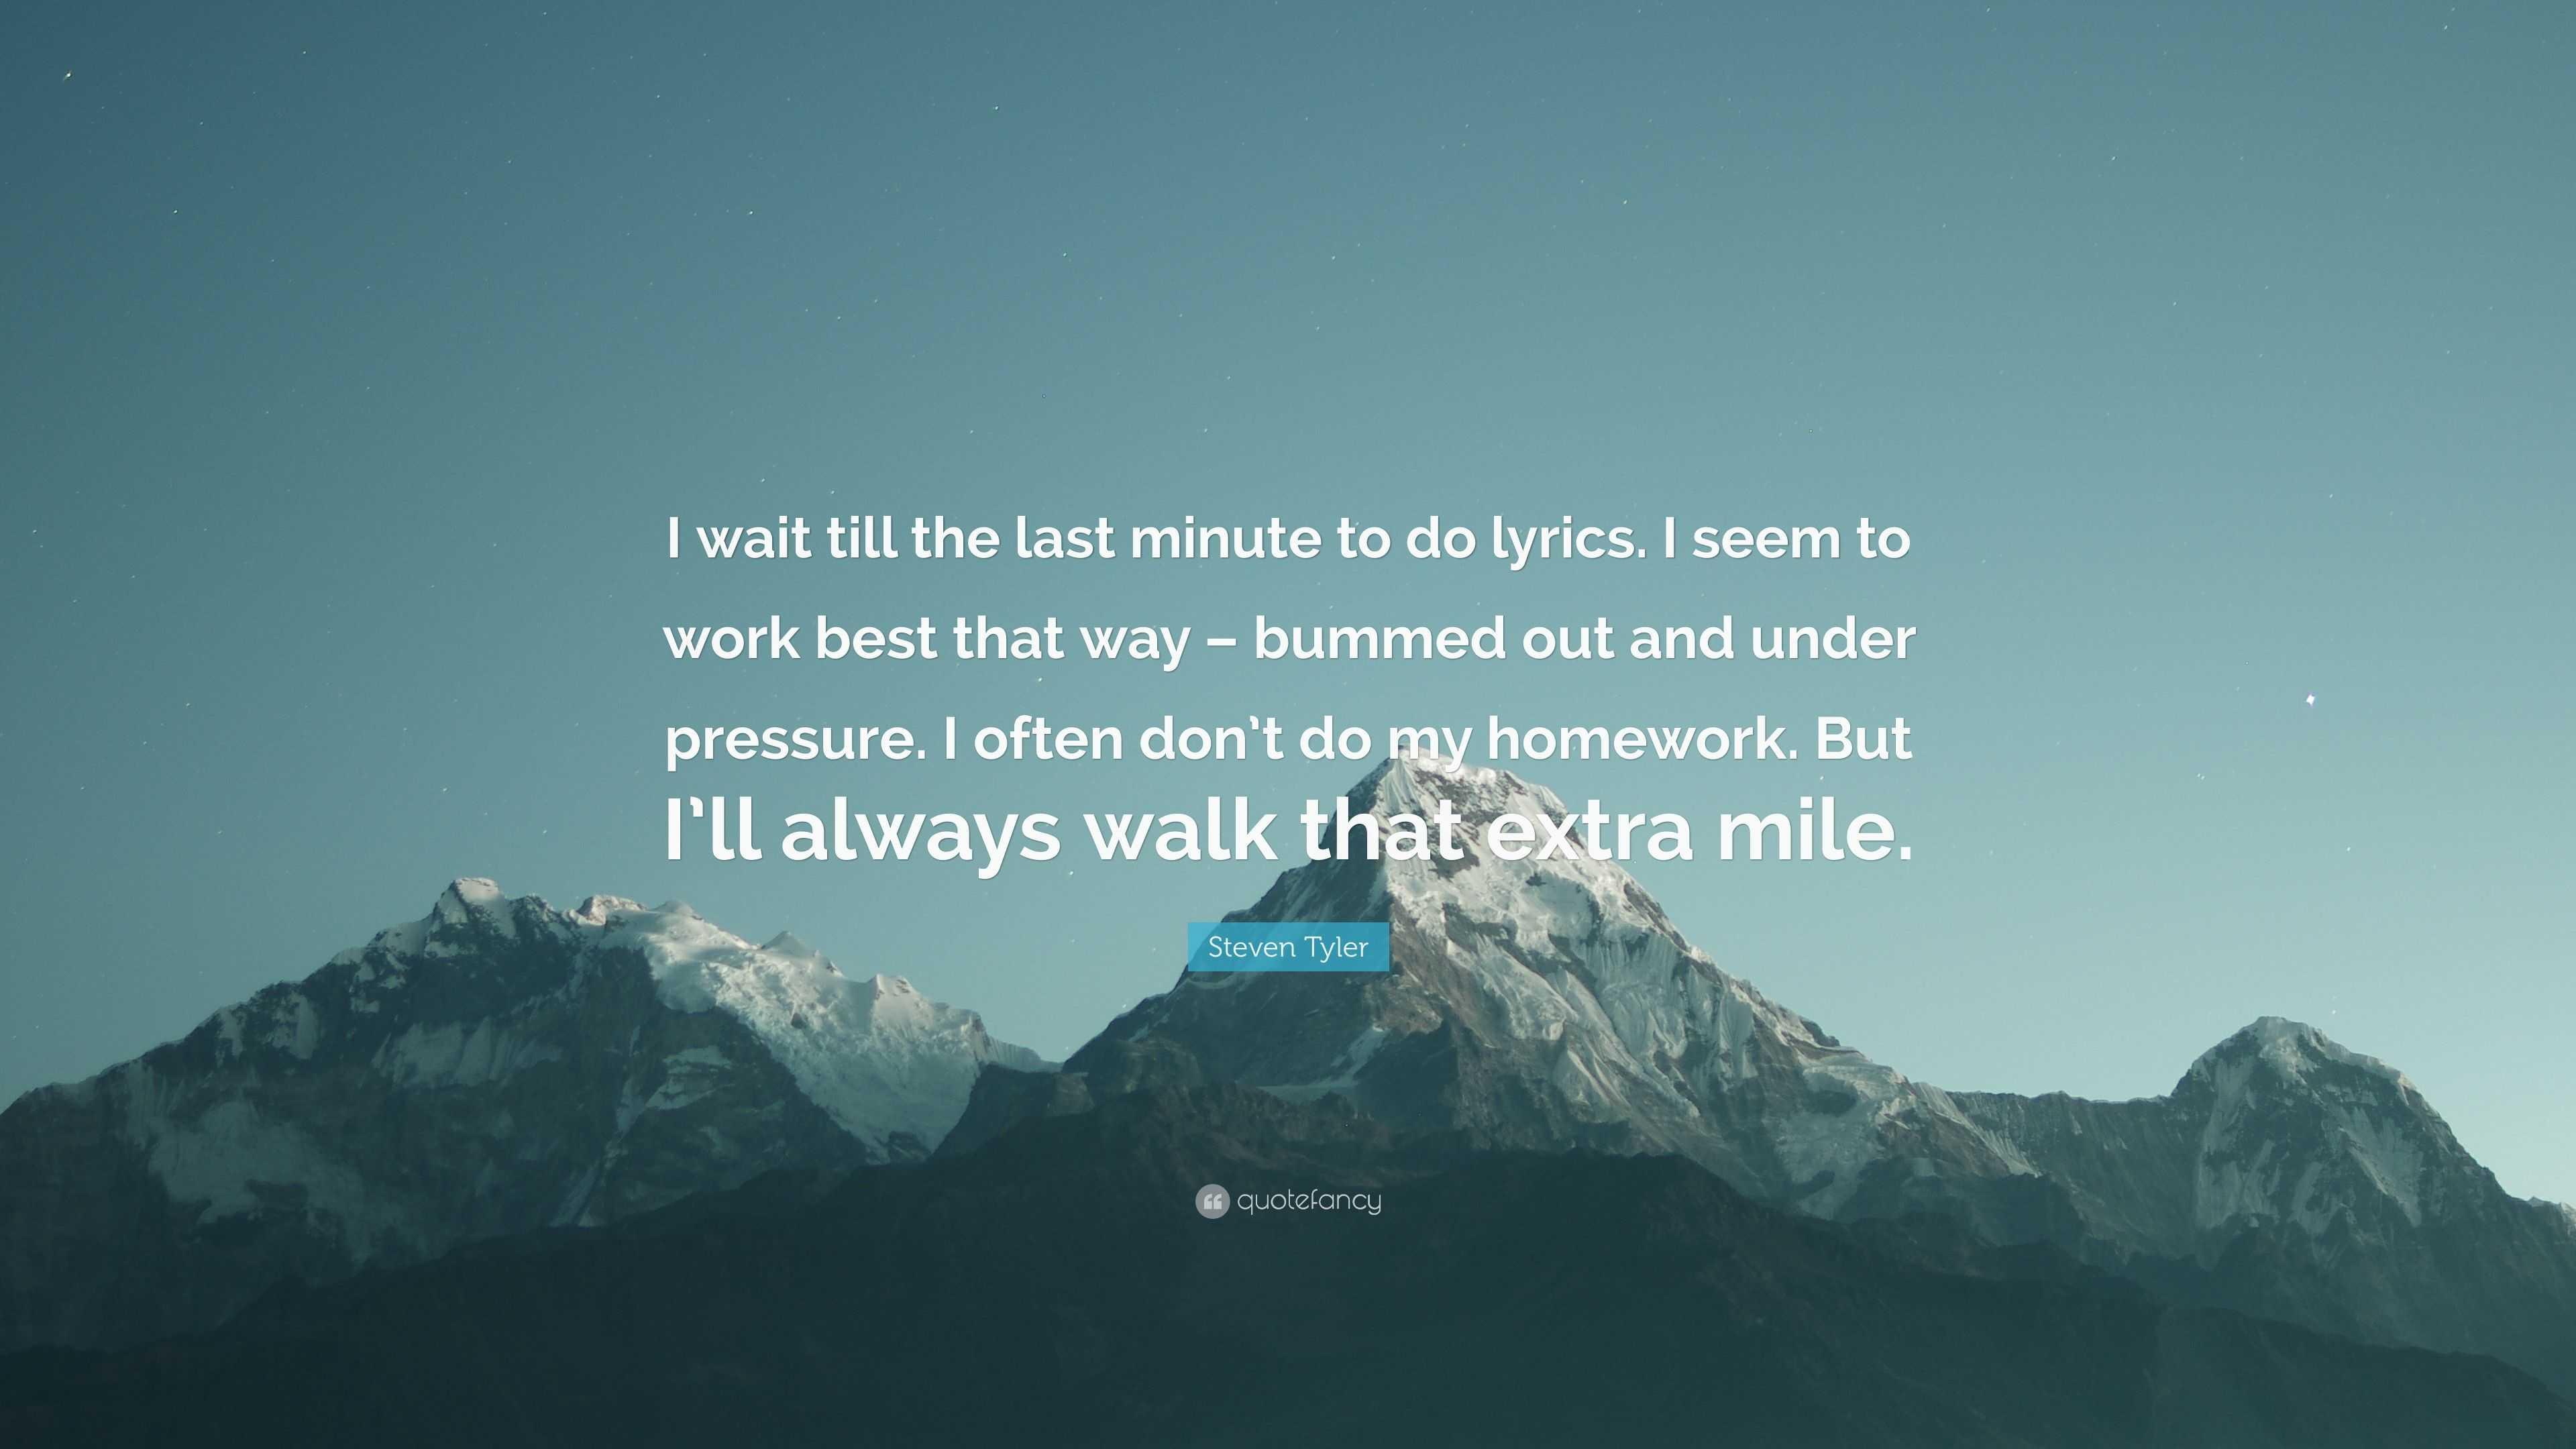 essay music concert nowadays